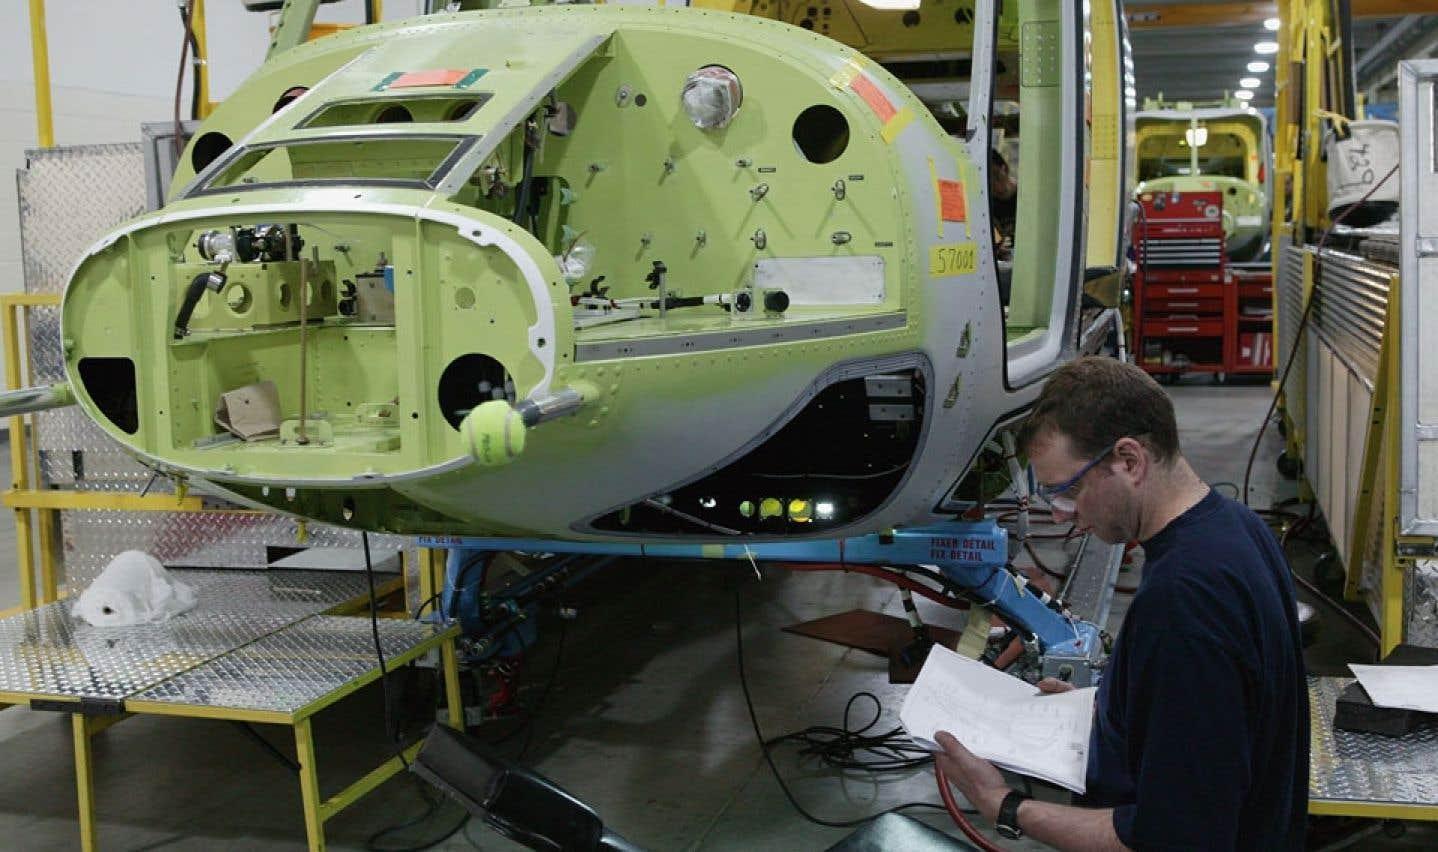 L'usine d'assemblage de Bell Helicopter à Mirabel